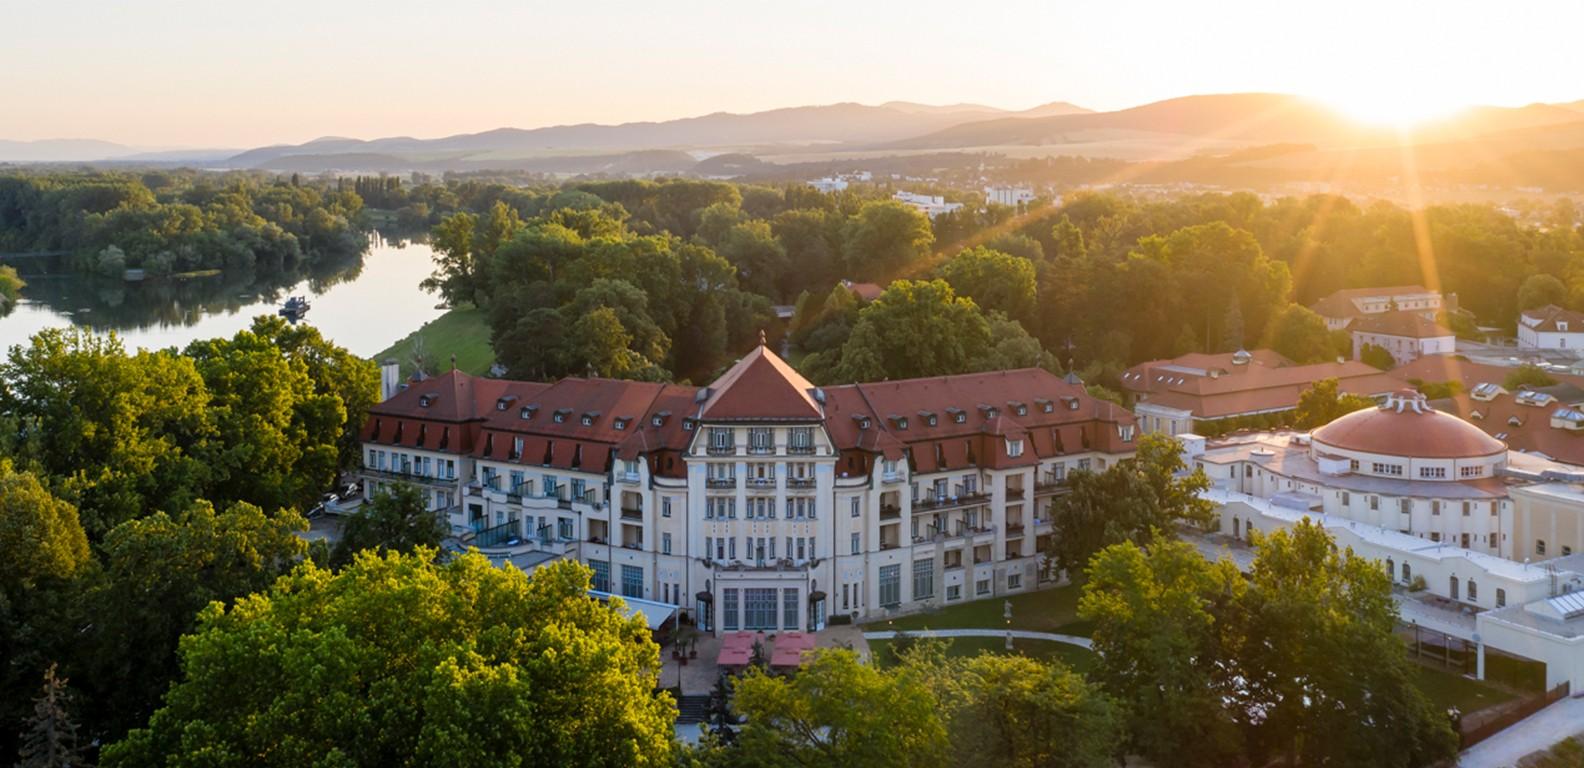 Piešťany & Smrdáky Ensana Spa Hotels | LinkedIn